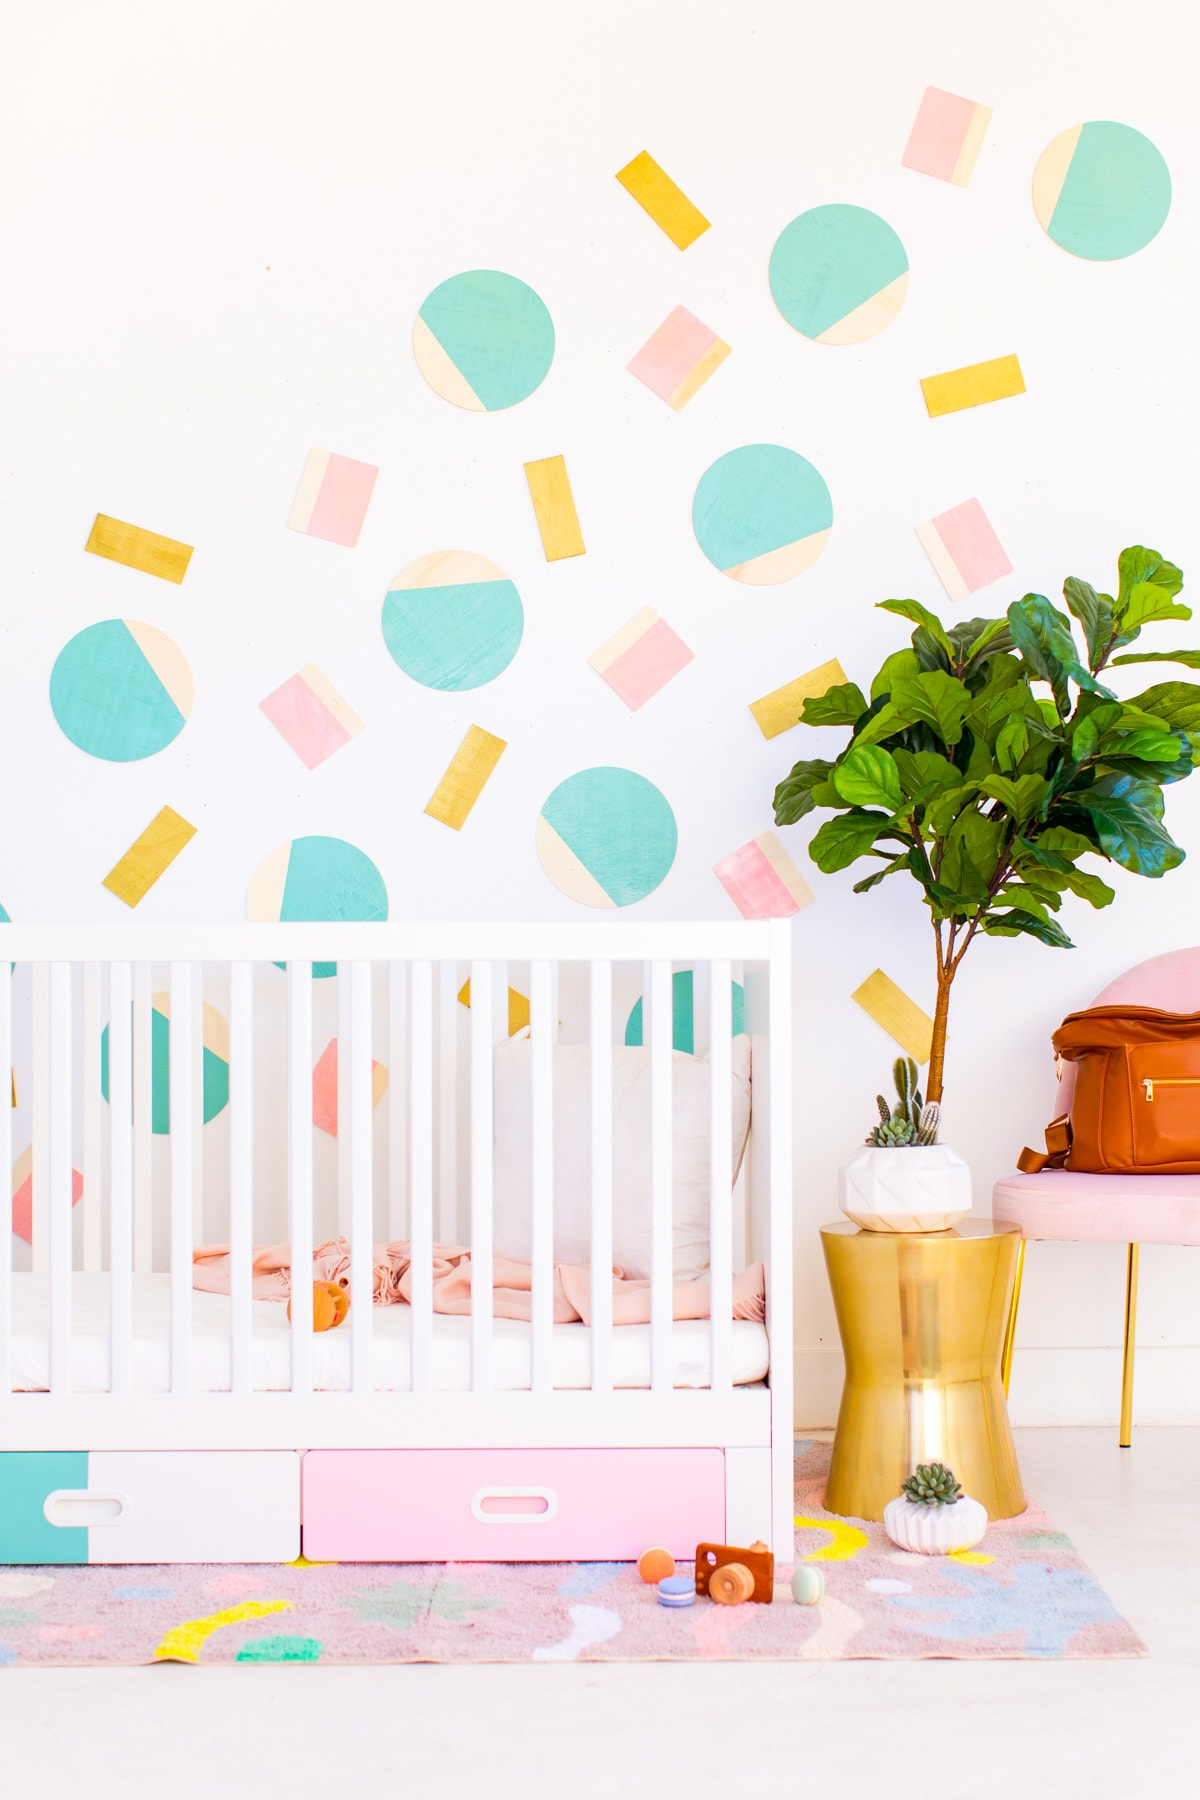 Nursery Wall Decor by Houston lifestyle blogger Ashley Rose of Sugar and Cloth -- #DIYBABYROOMDECOR #KRYLON #SPRAYPAINTPROJECT #NURSERYIDEAS